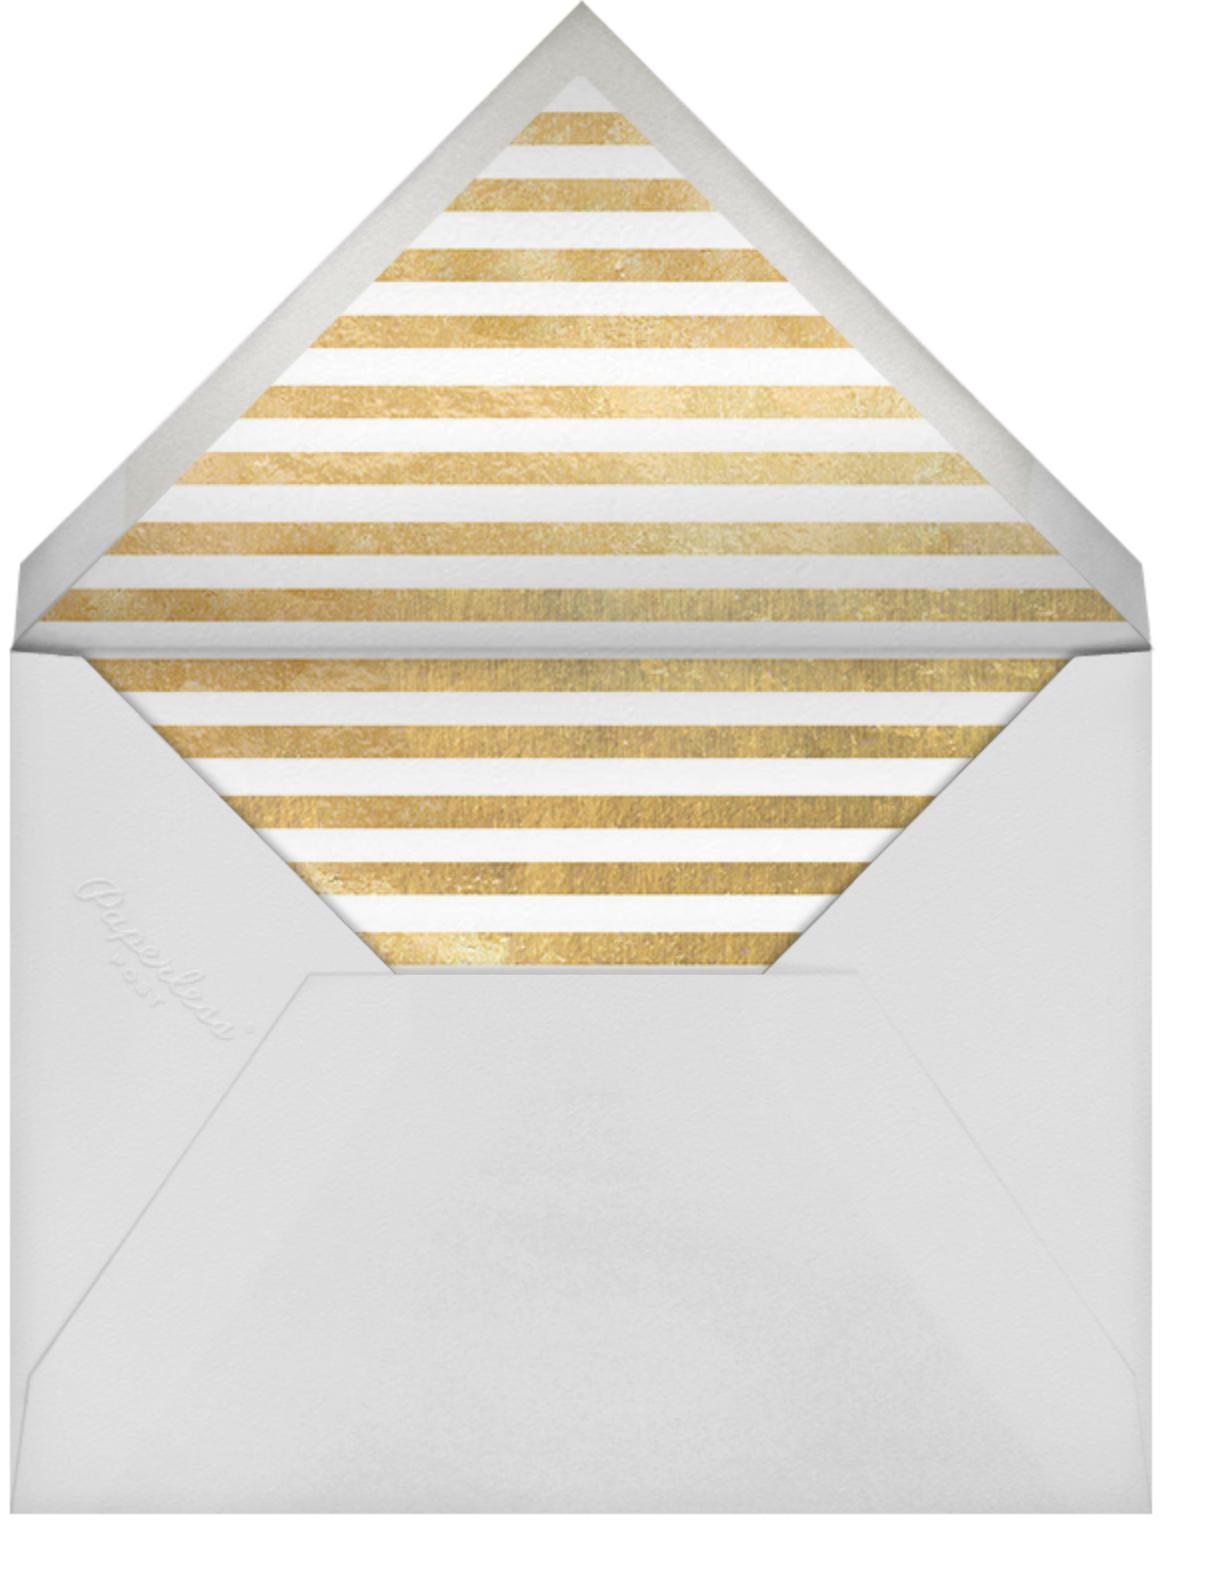 Come Celebrate - Aqua/Gold - kate spade new york - Adult birthday - envelope back